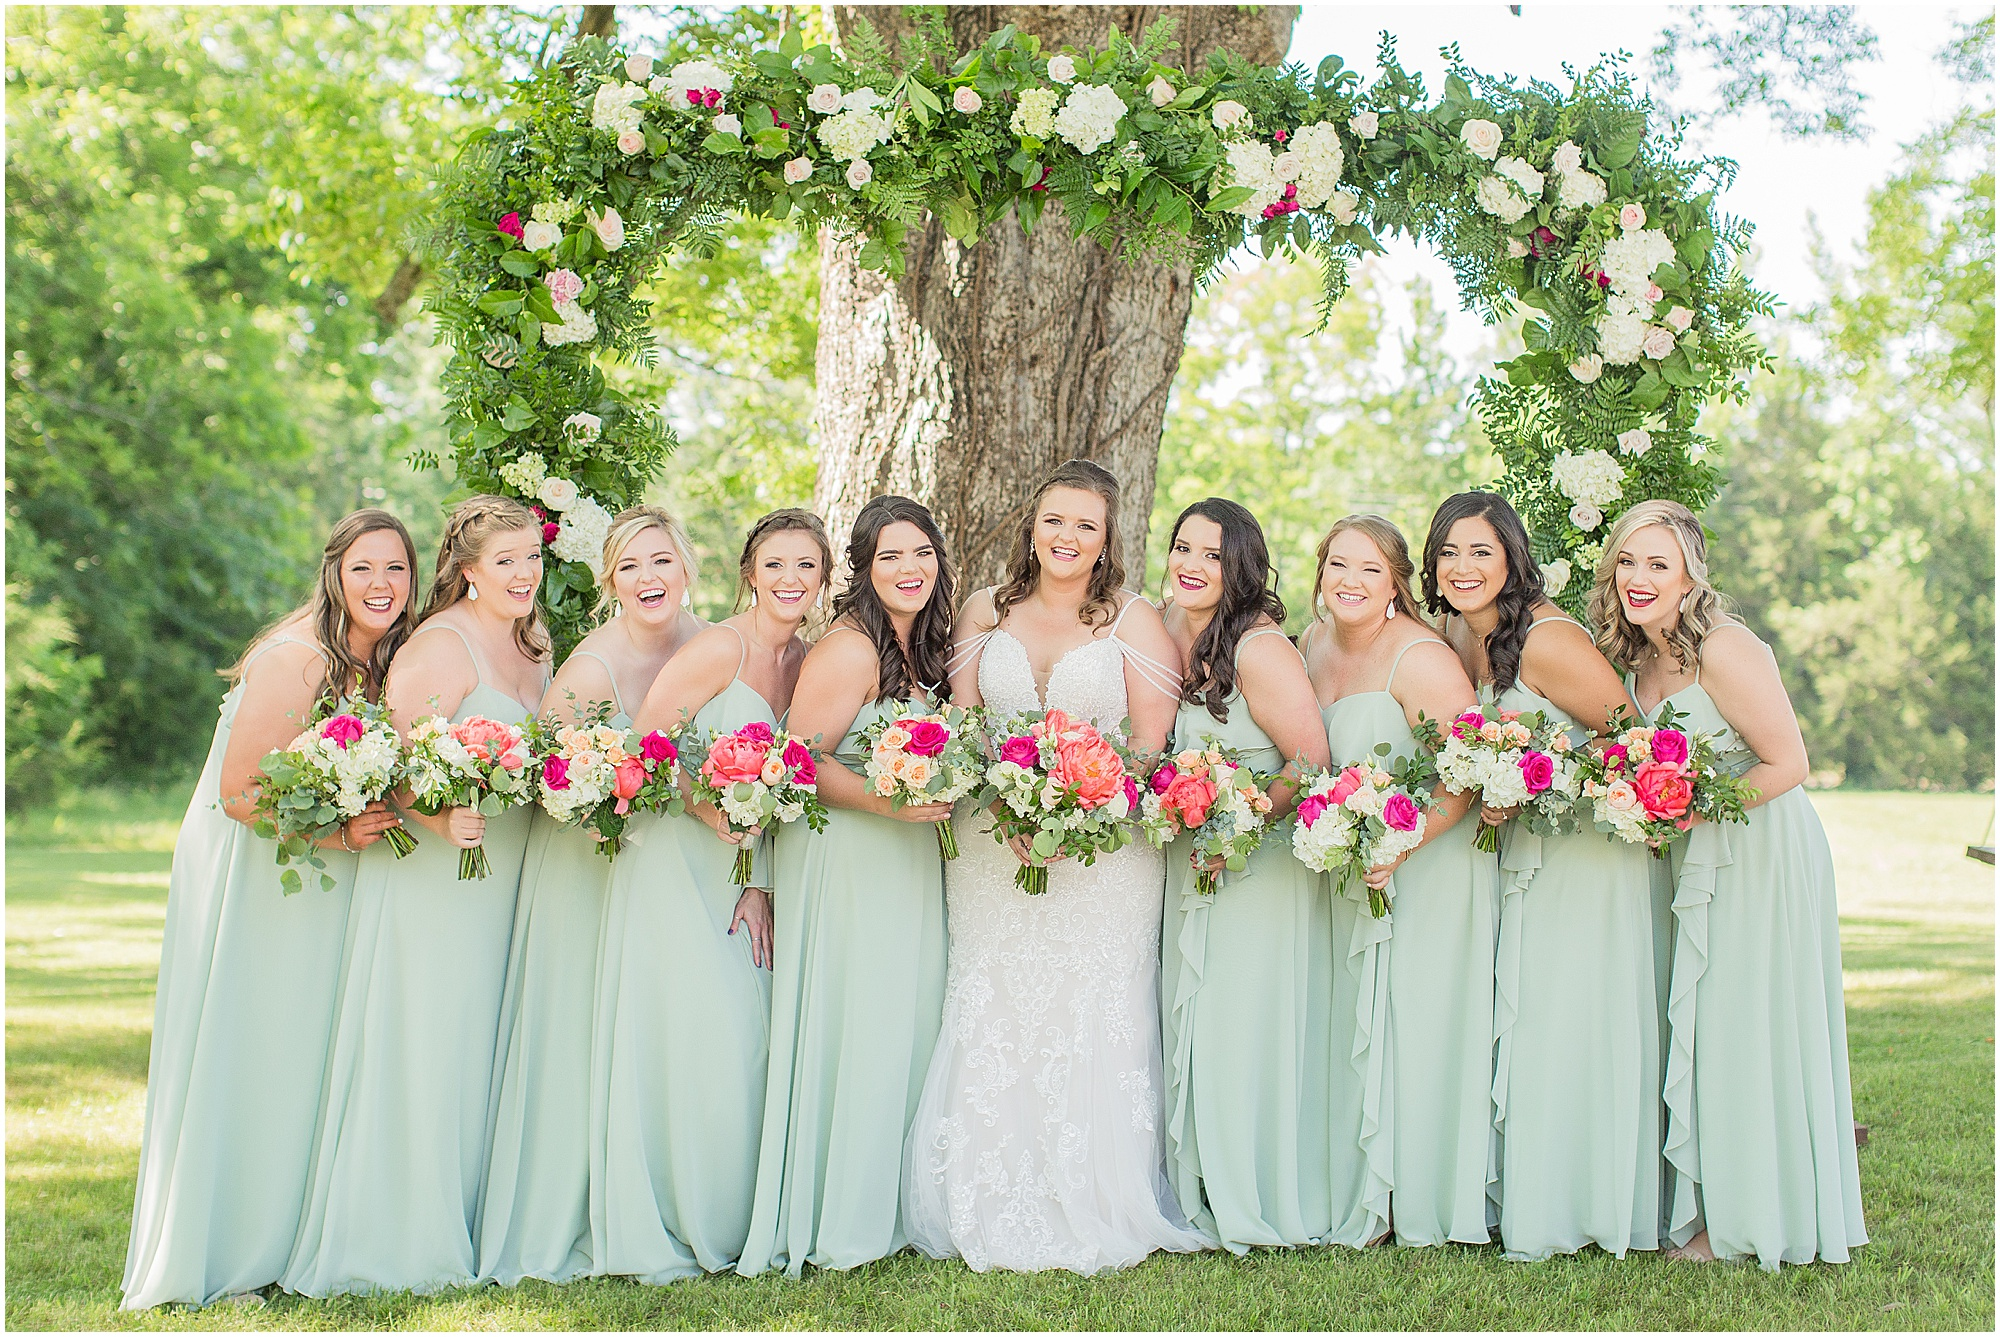 starkville-mississippi-wedding-page-place-dodson-farms_0044.jpg